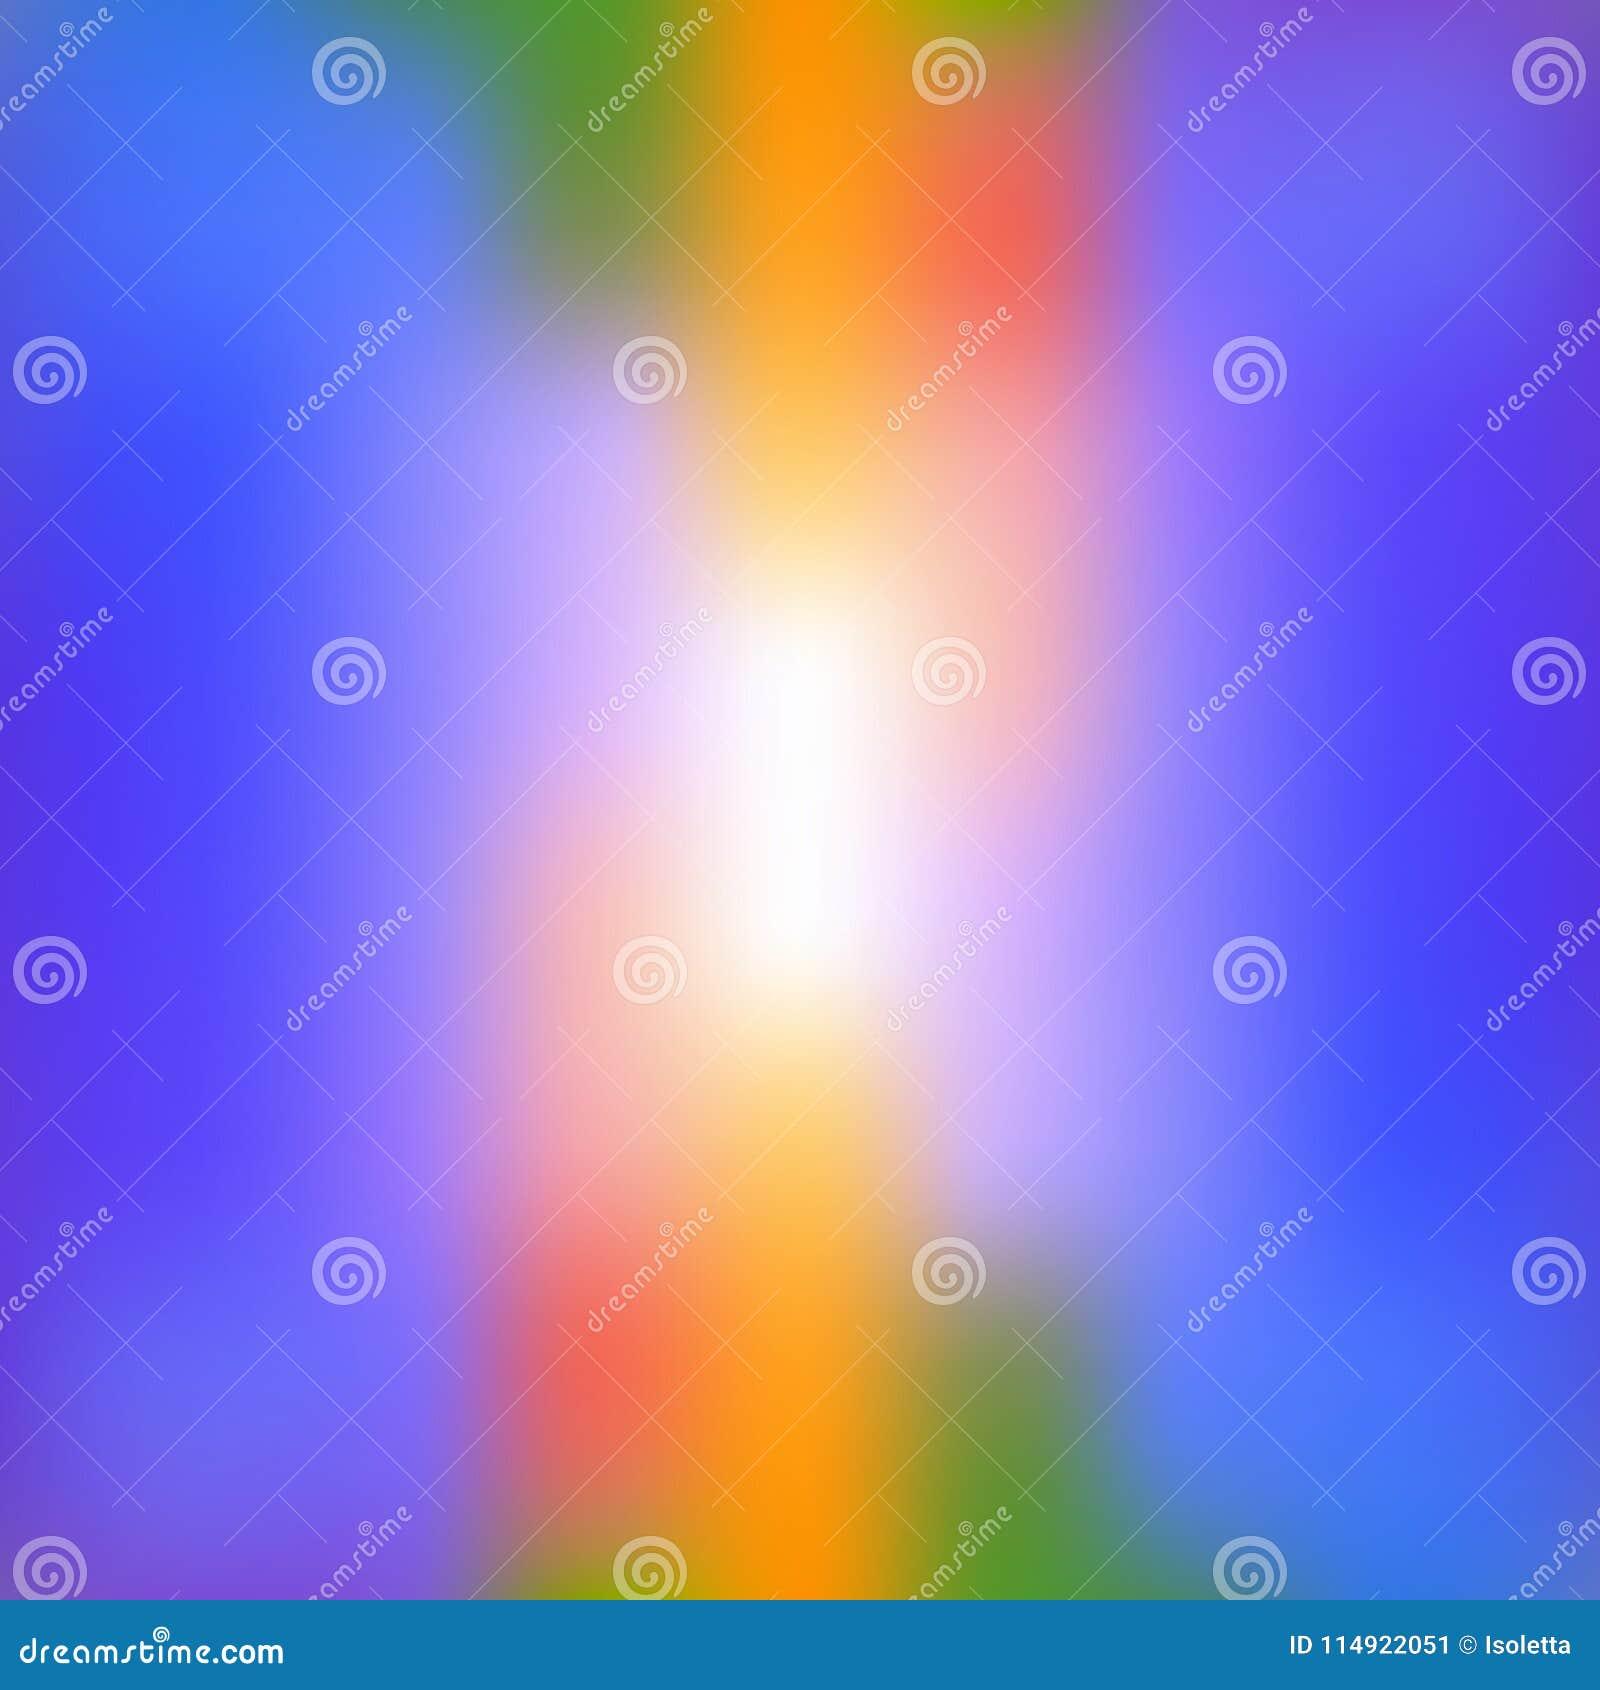 Bunter abstrakter heller unscharfer Hintergrund in den vibrierenden Farben Dekorative Designbeschaffenheit